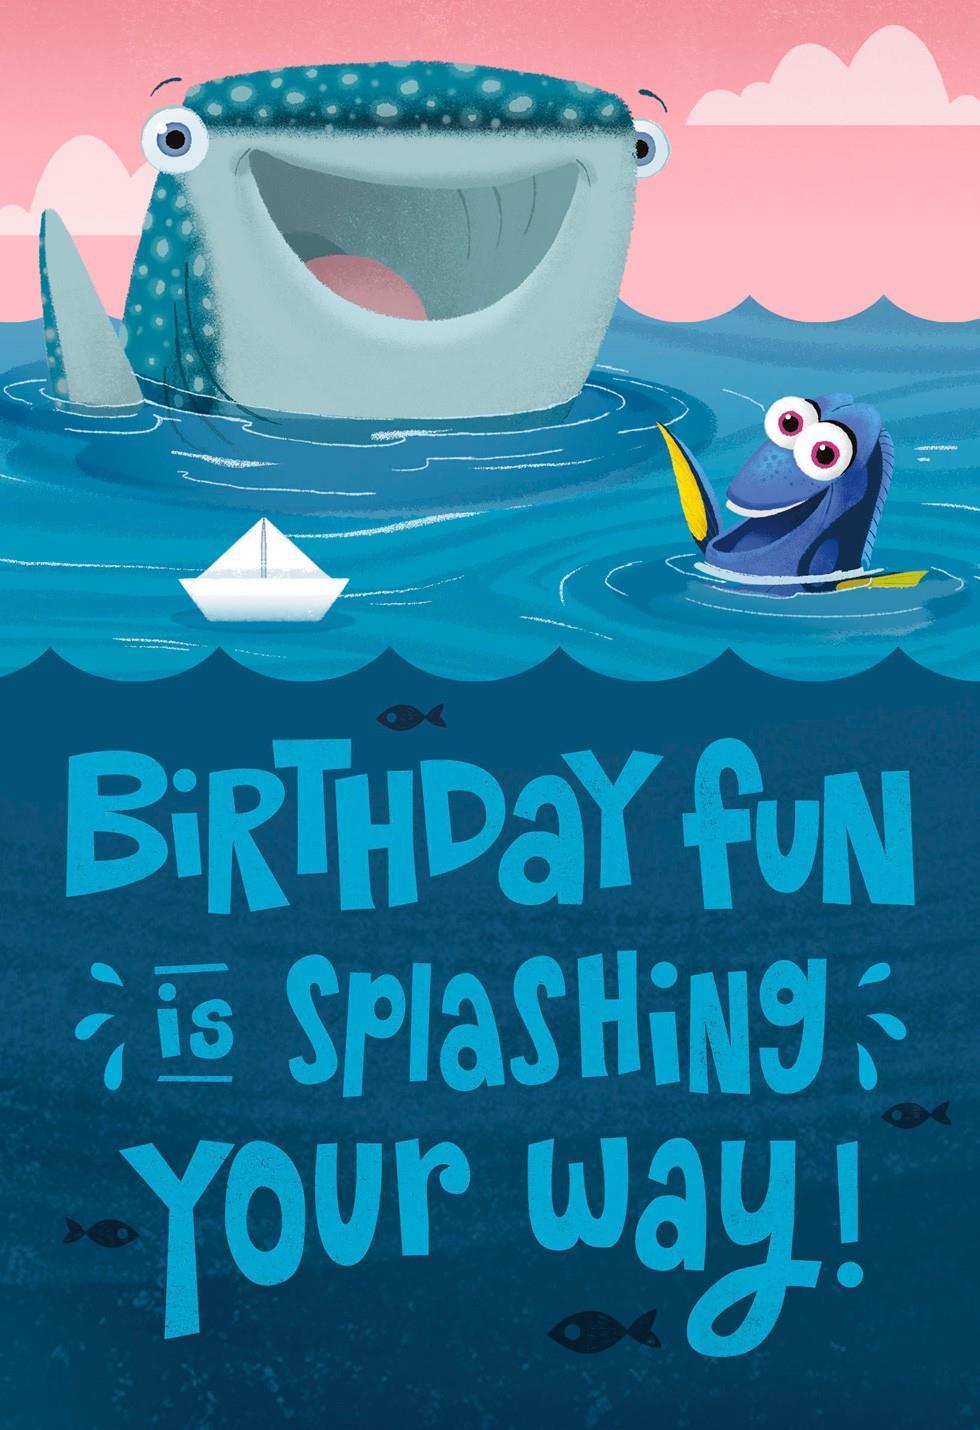 Splashing Your Way Kids Birthday Song Card Greeting Cards Hallmark – Birthday Song Cards